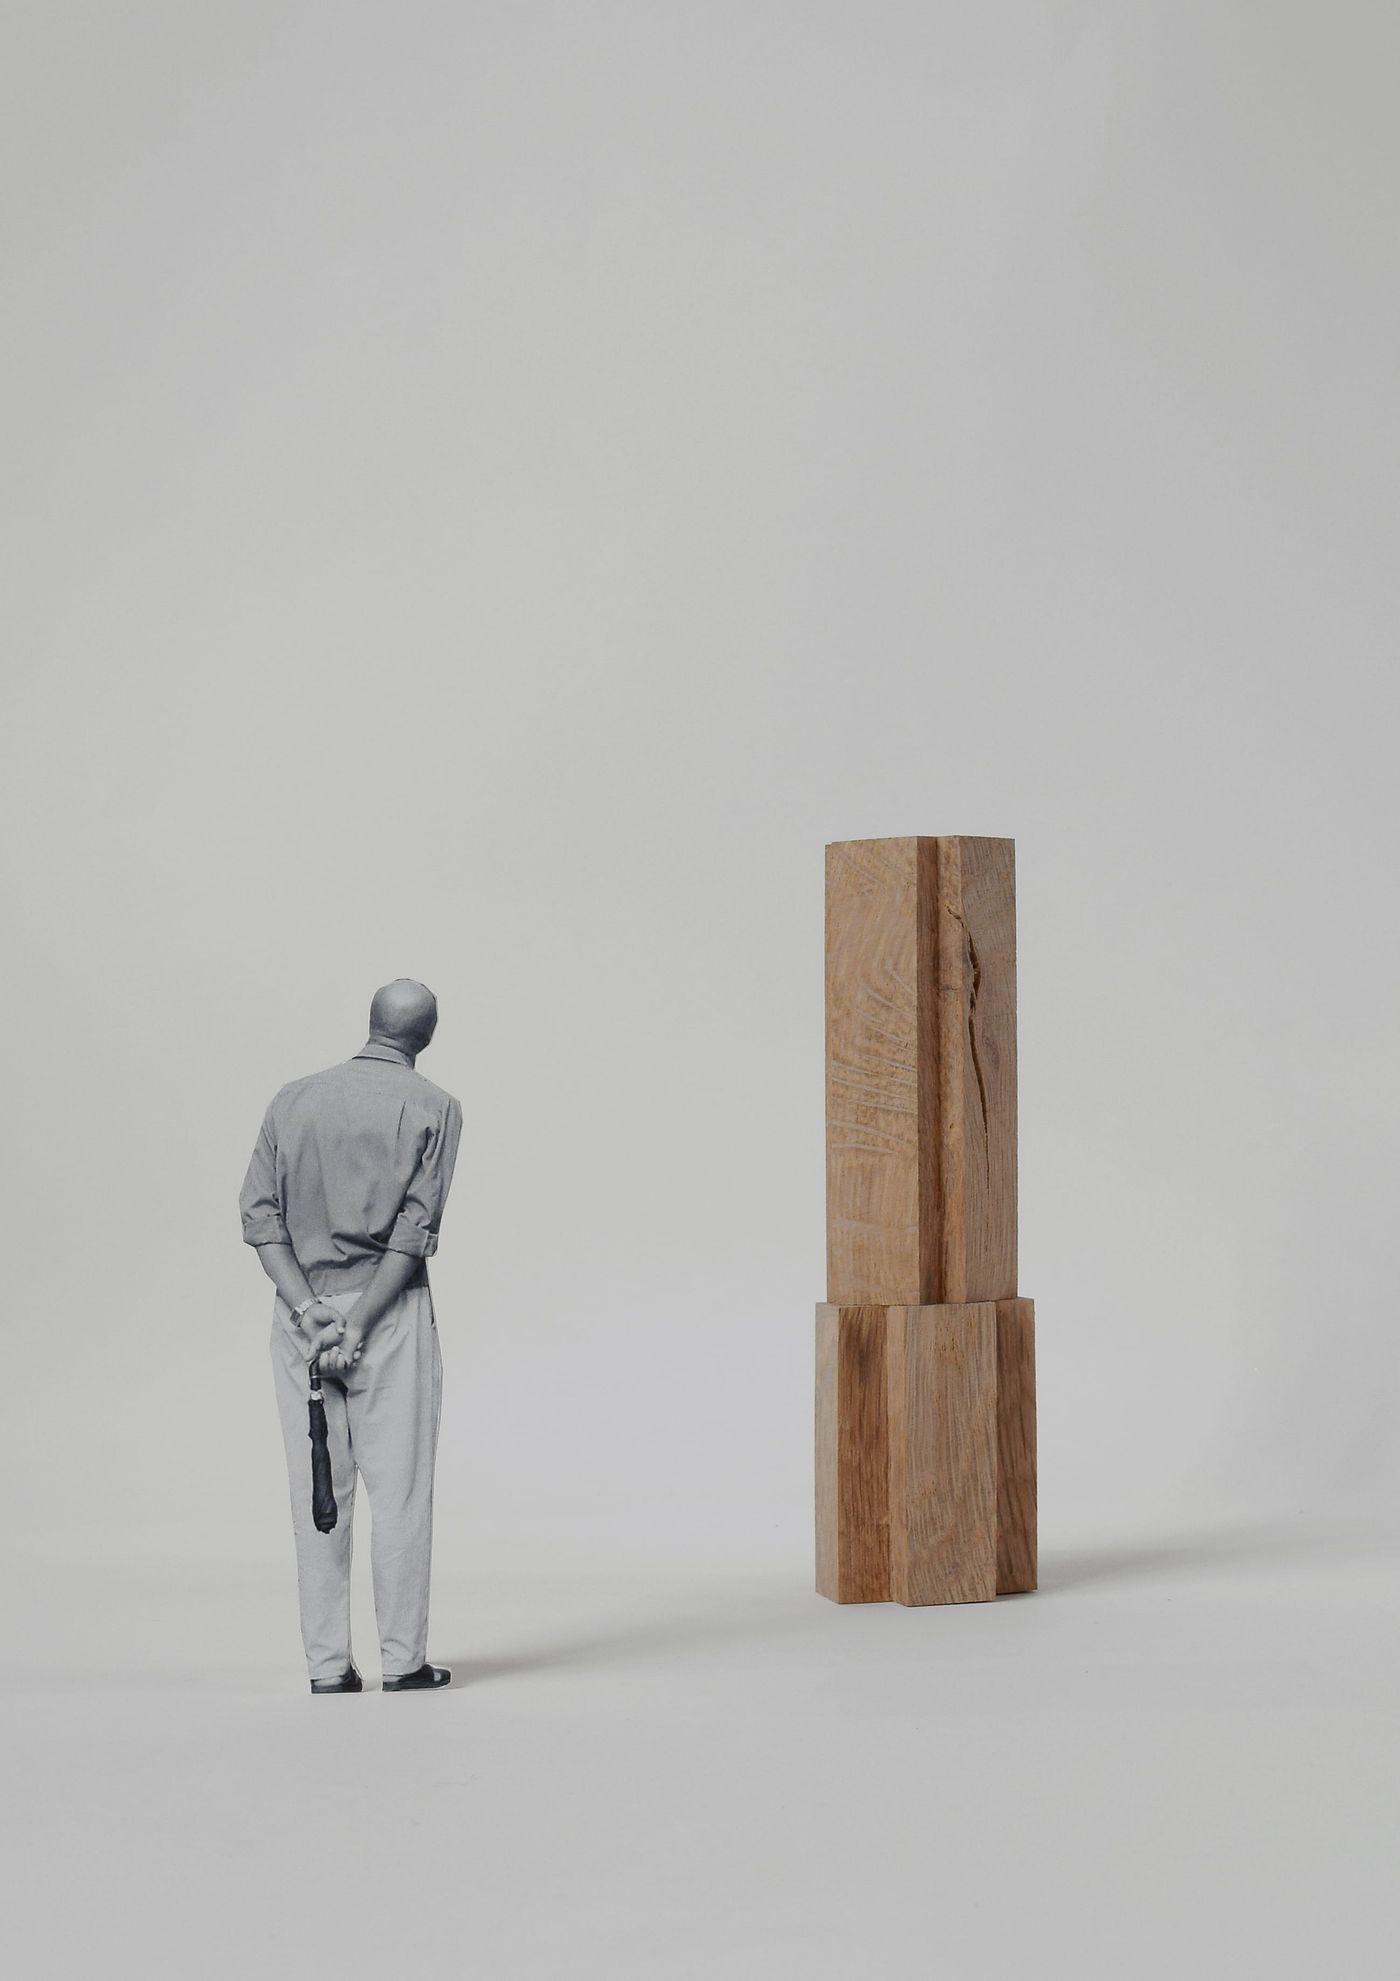 Timber totem sculpture designed by From Works for Bishopstoke Park.